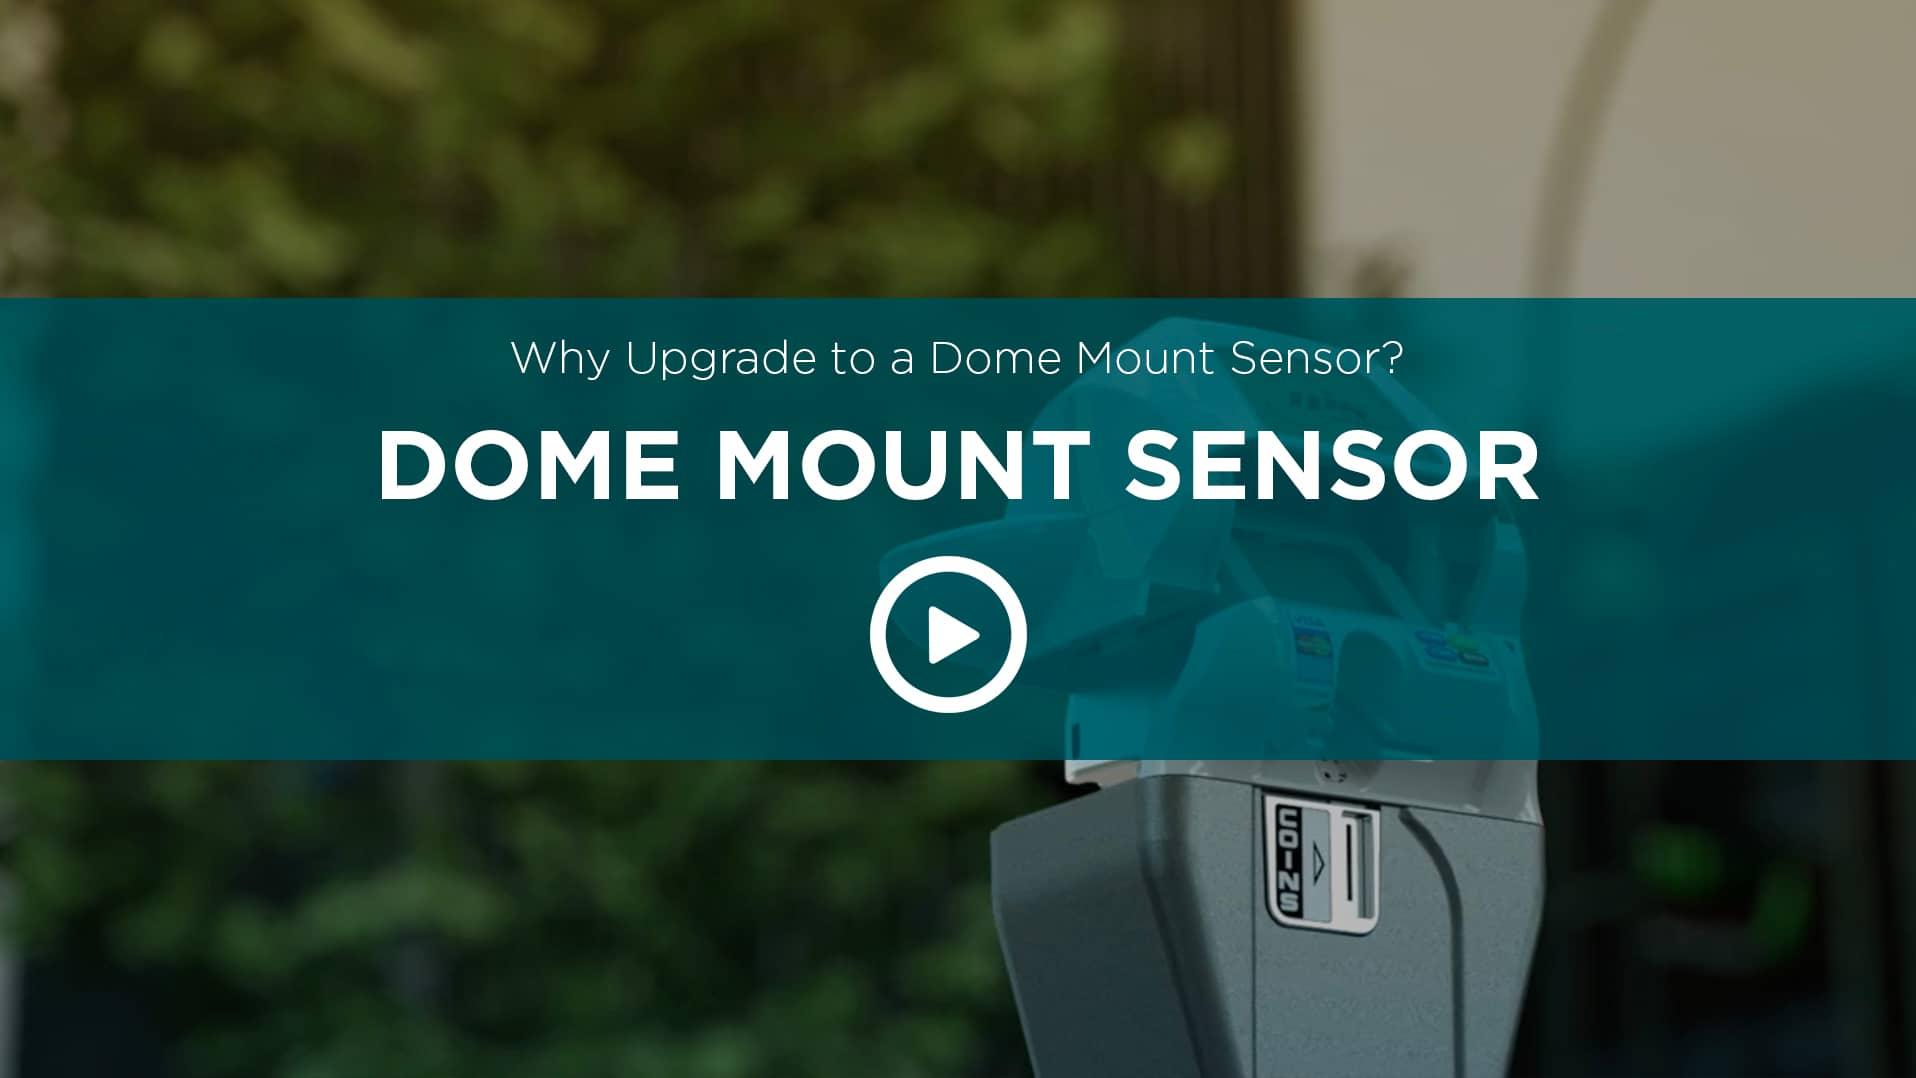 Dome Mount Sensor